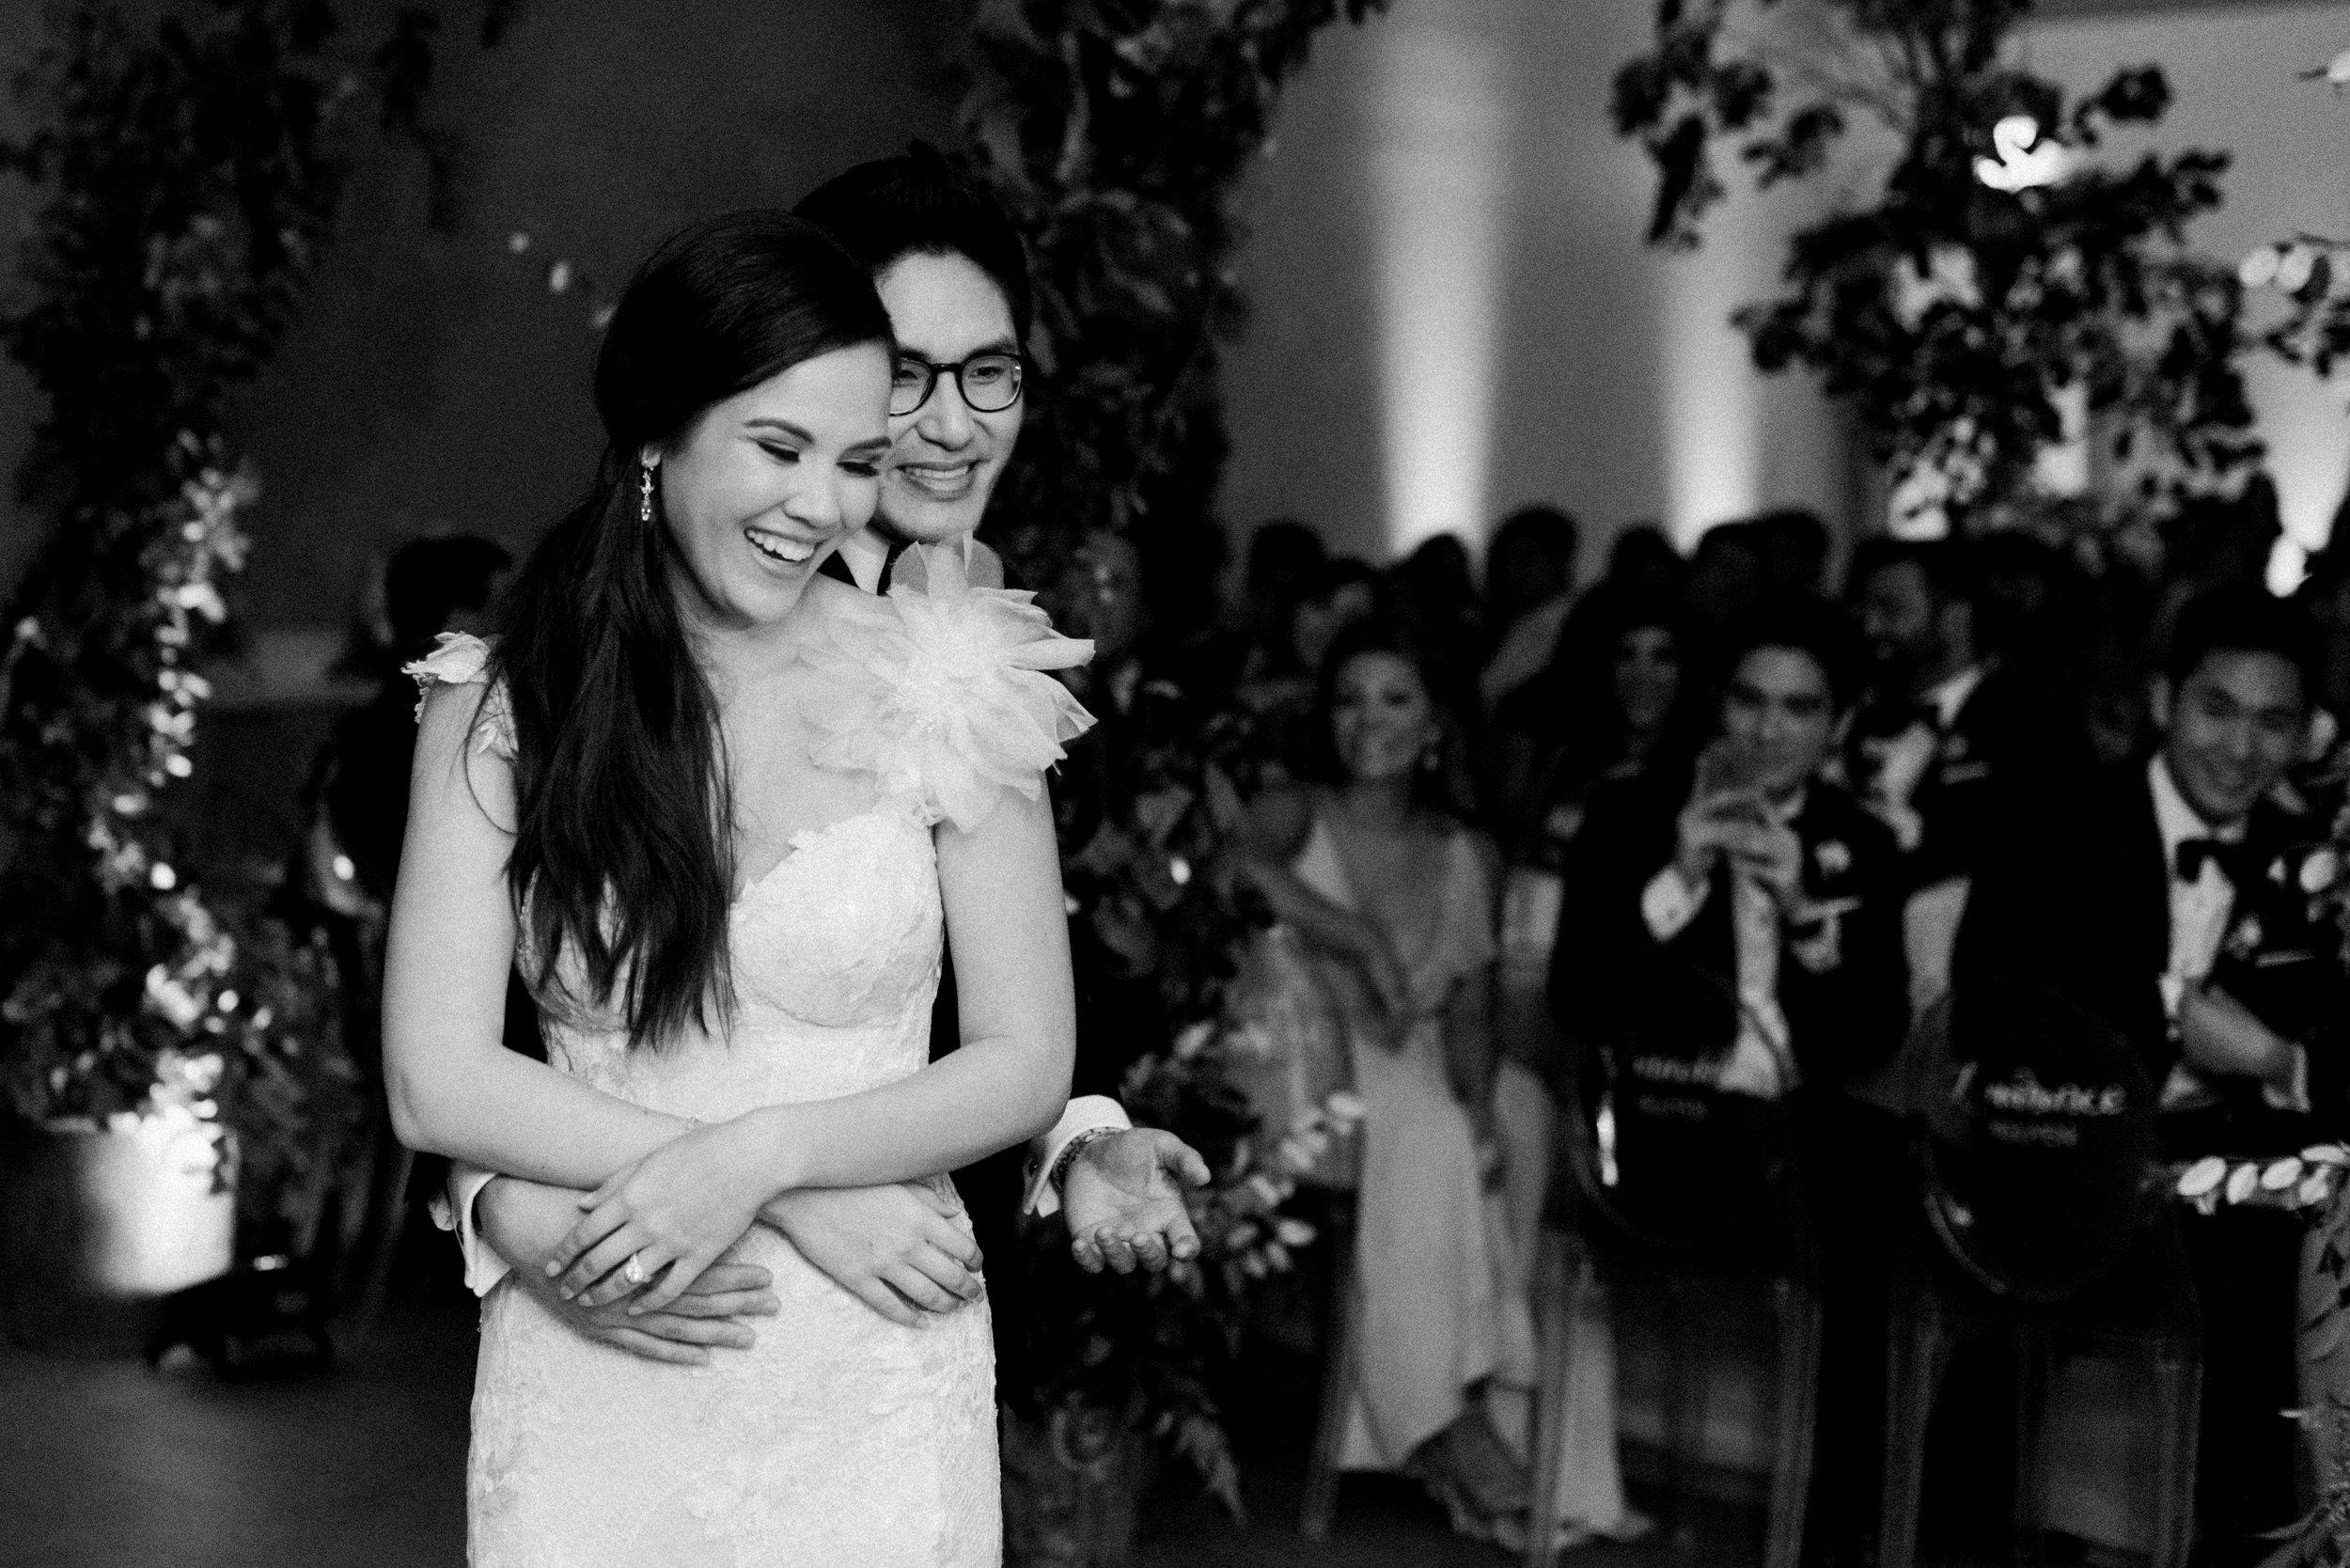 Martha-Stewart-Wedding-Dana-Fernandez-Photography-Josh-Texas-Film-Houston-Wedding-Fine-Art-Photographer-McGovern-Centennial-Gardens-Top-Best-51.jpg